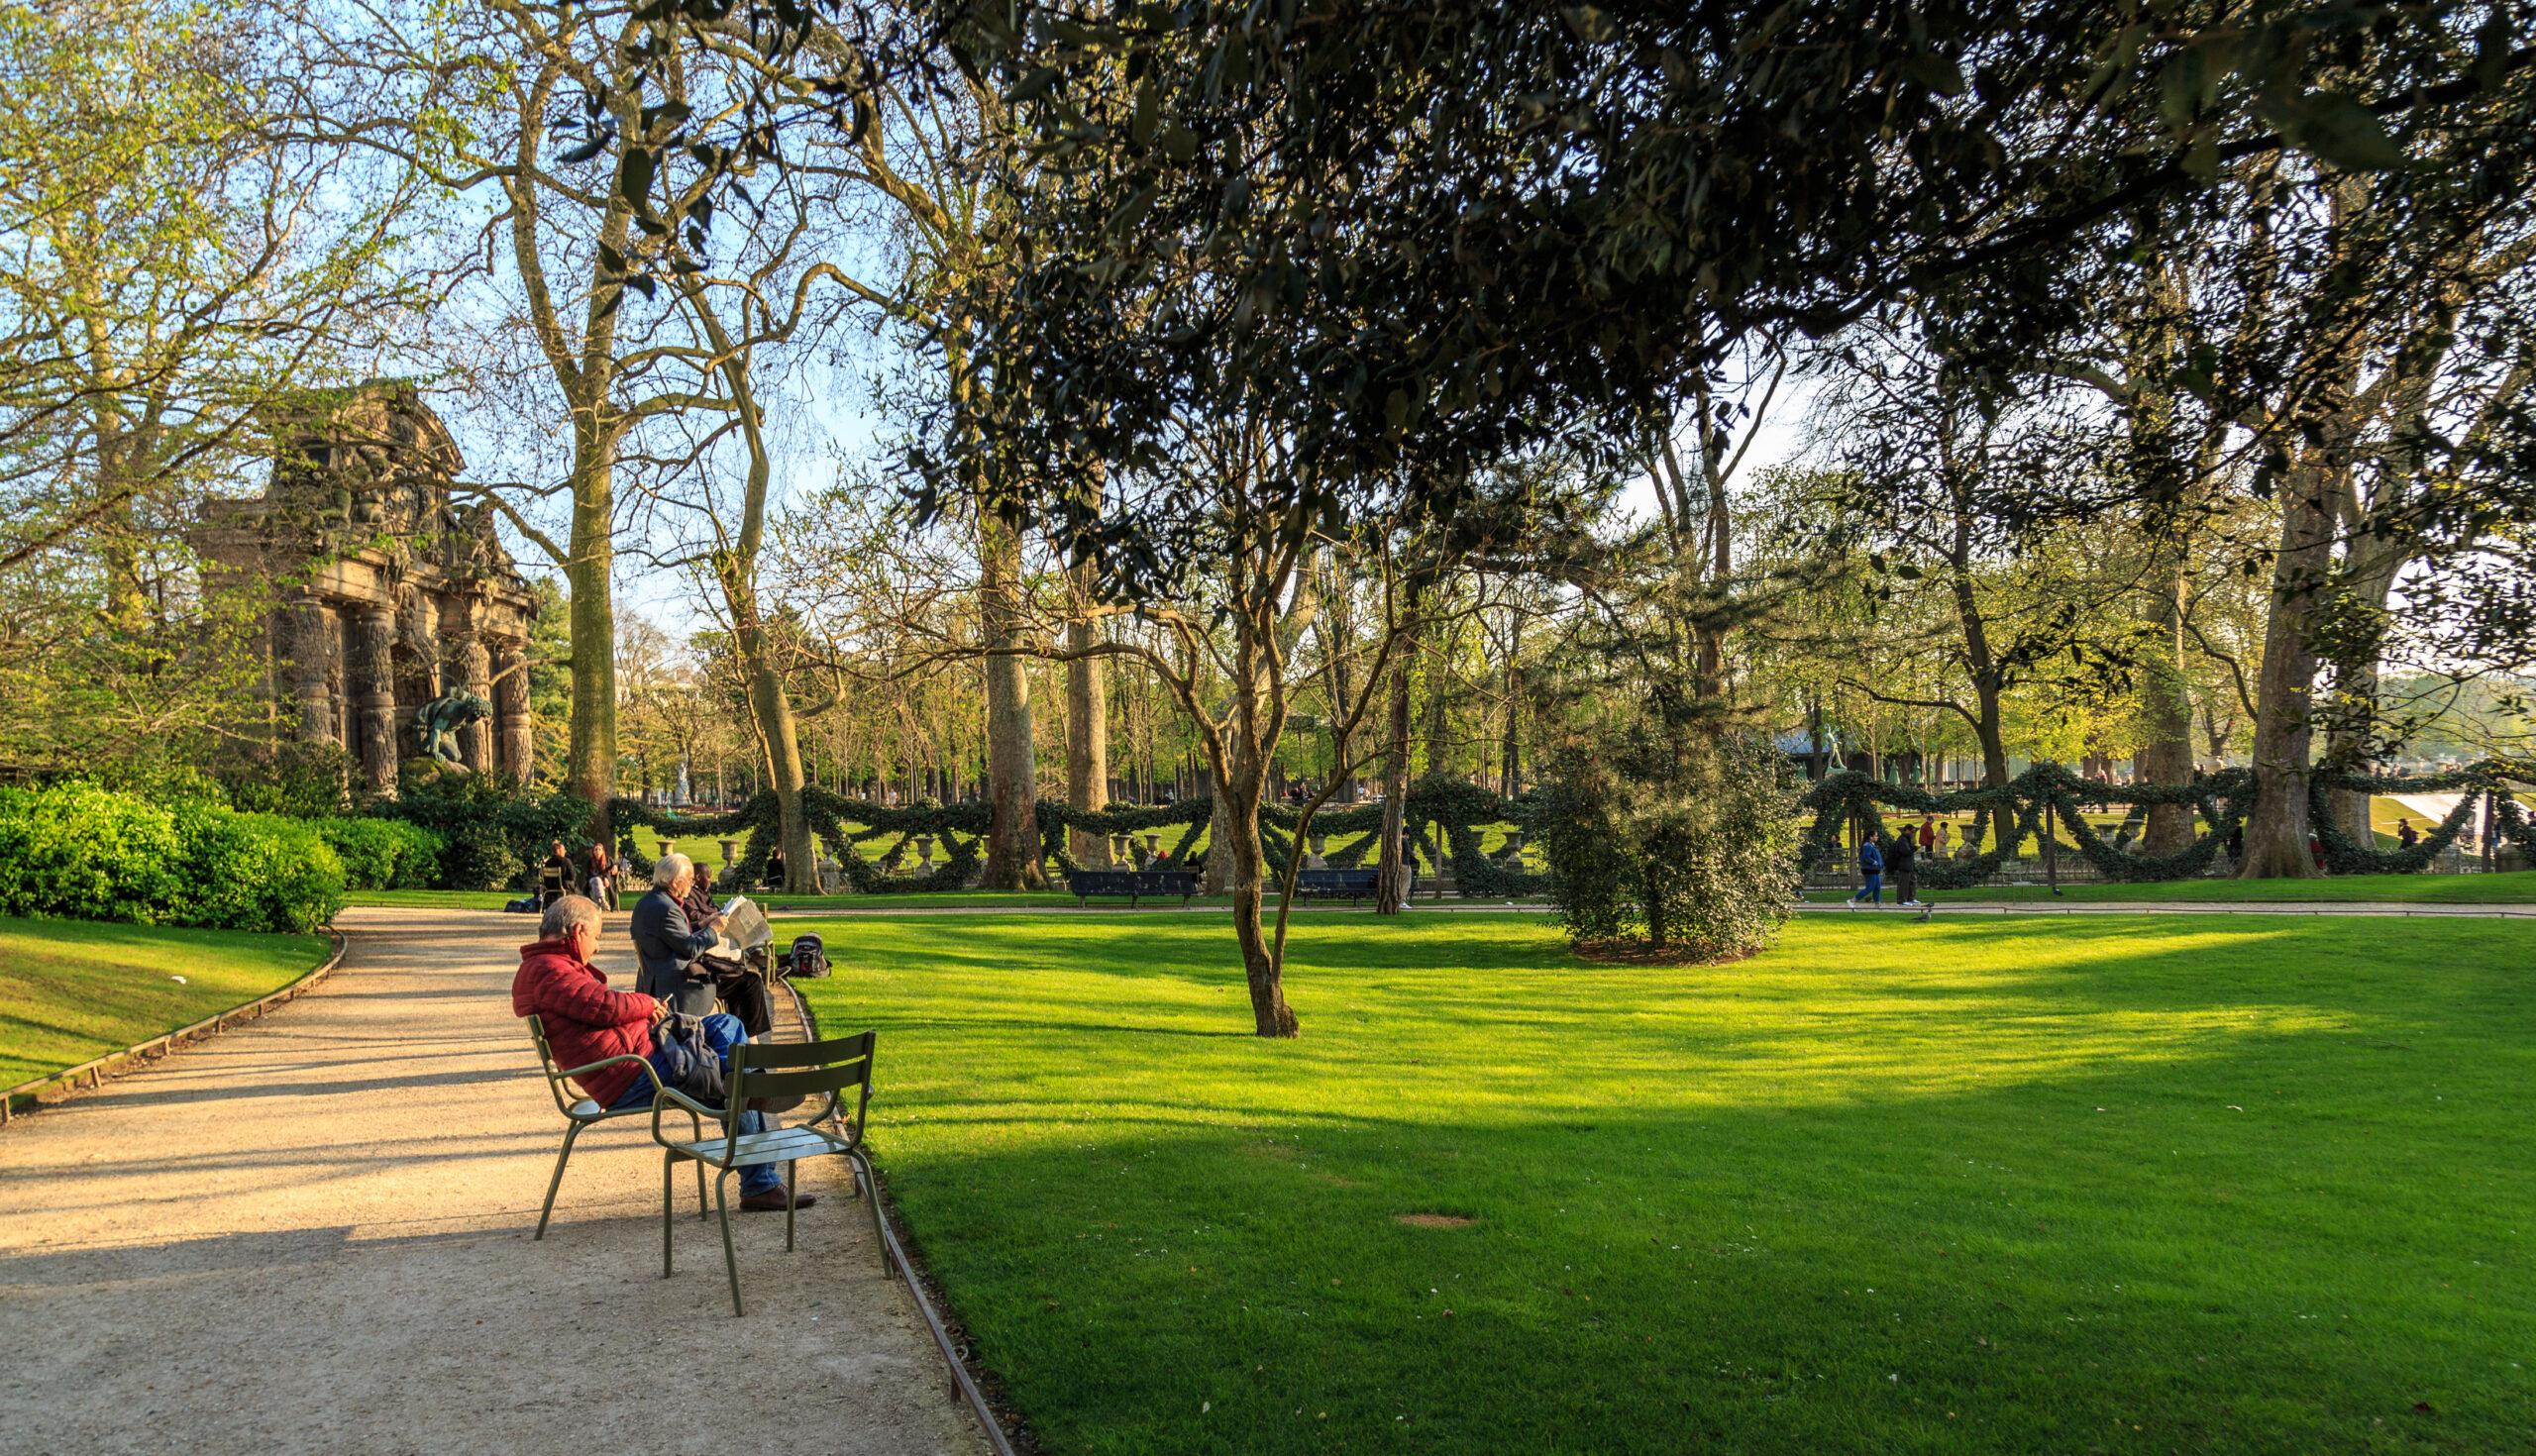 Jardin du Luxembourg slott Paris besoke severdighet hage park